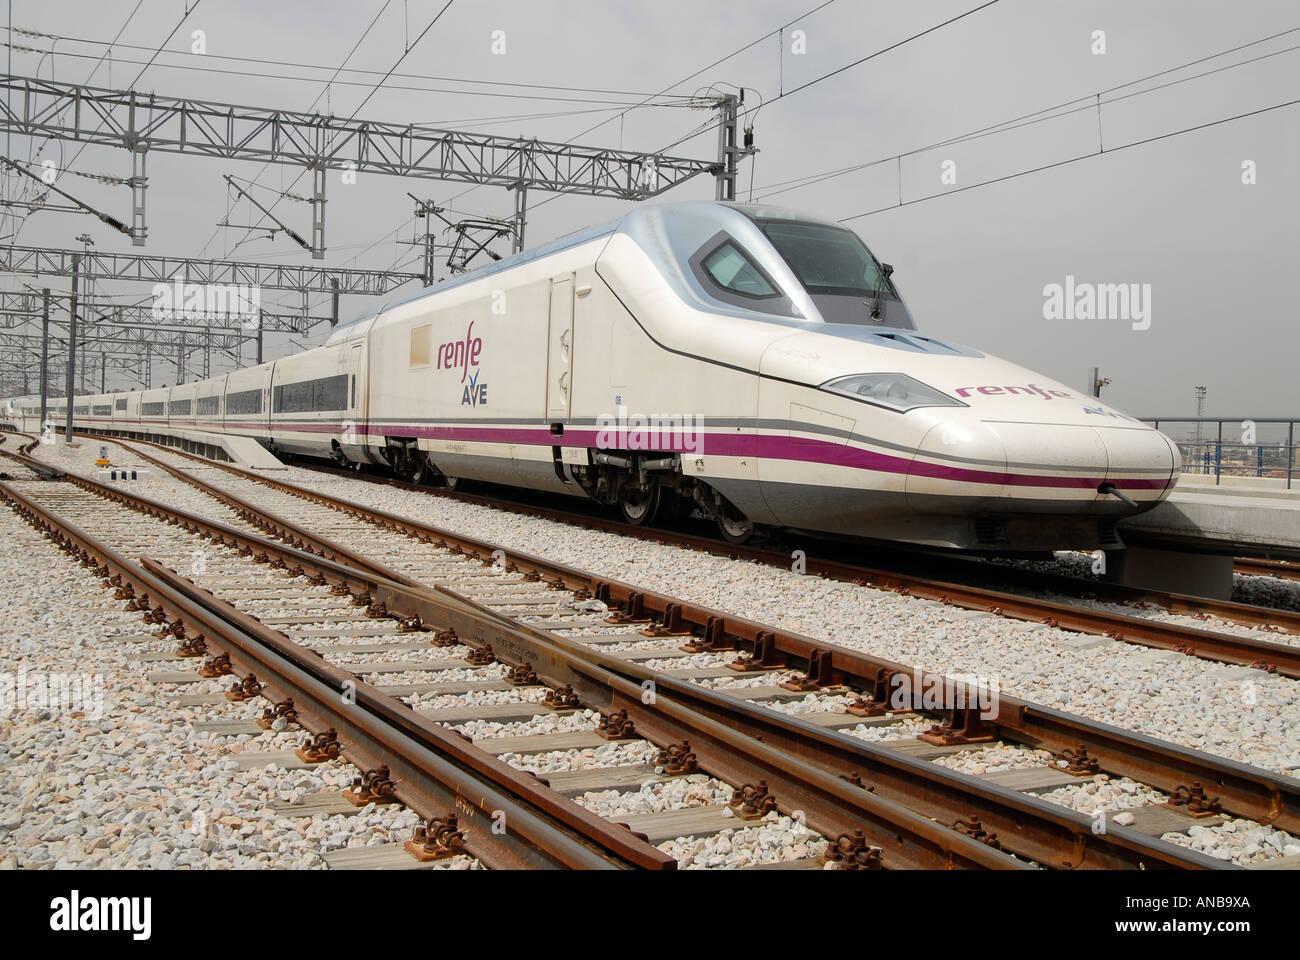 Ave Talgo Renfe. Spain railway. High speed train Stock ...